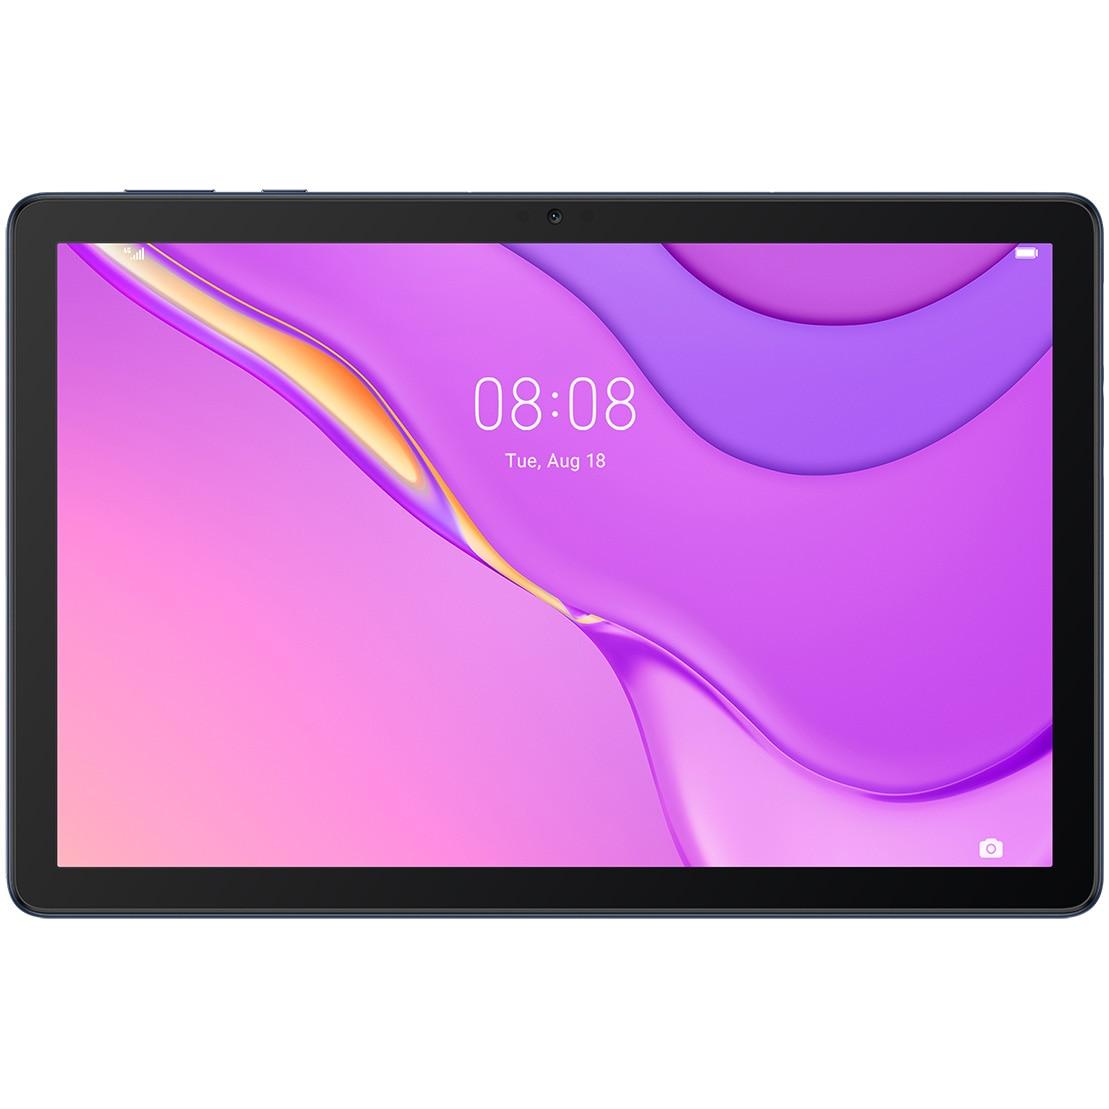 "Fotografie Tableta Huawei MatePad T10s, Octa-Core, 10.1"", 2GB RAM, 32GB, Wi-Fi, Deepsea Blue"